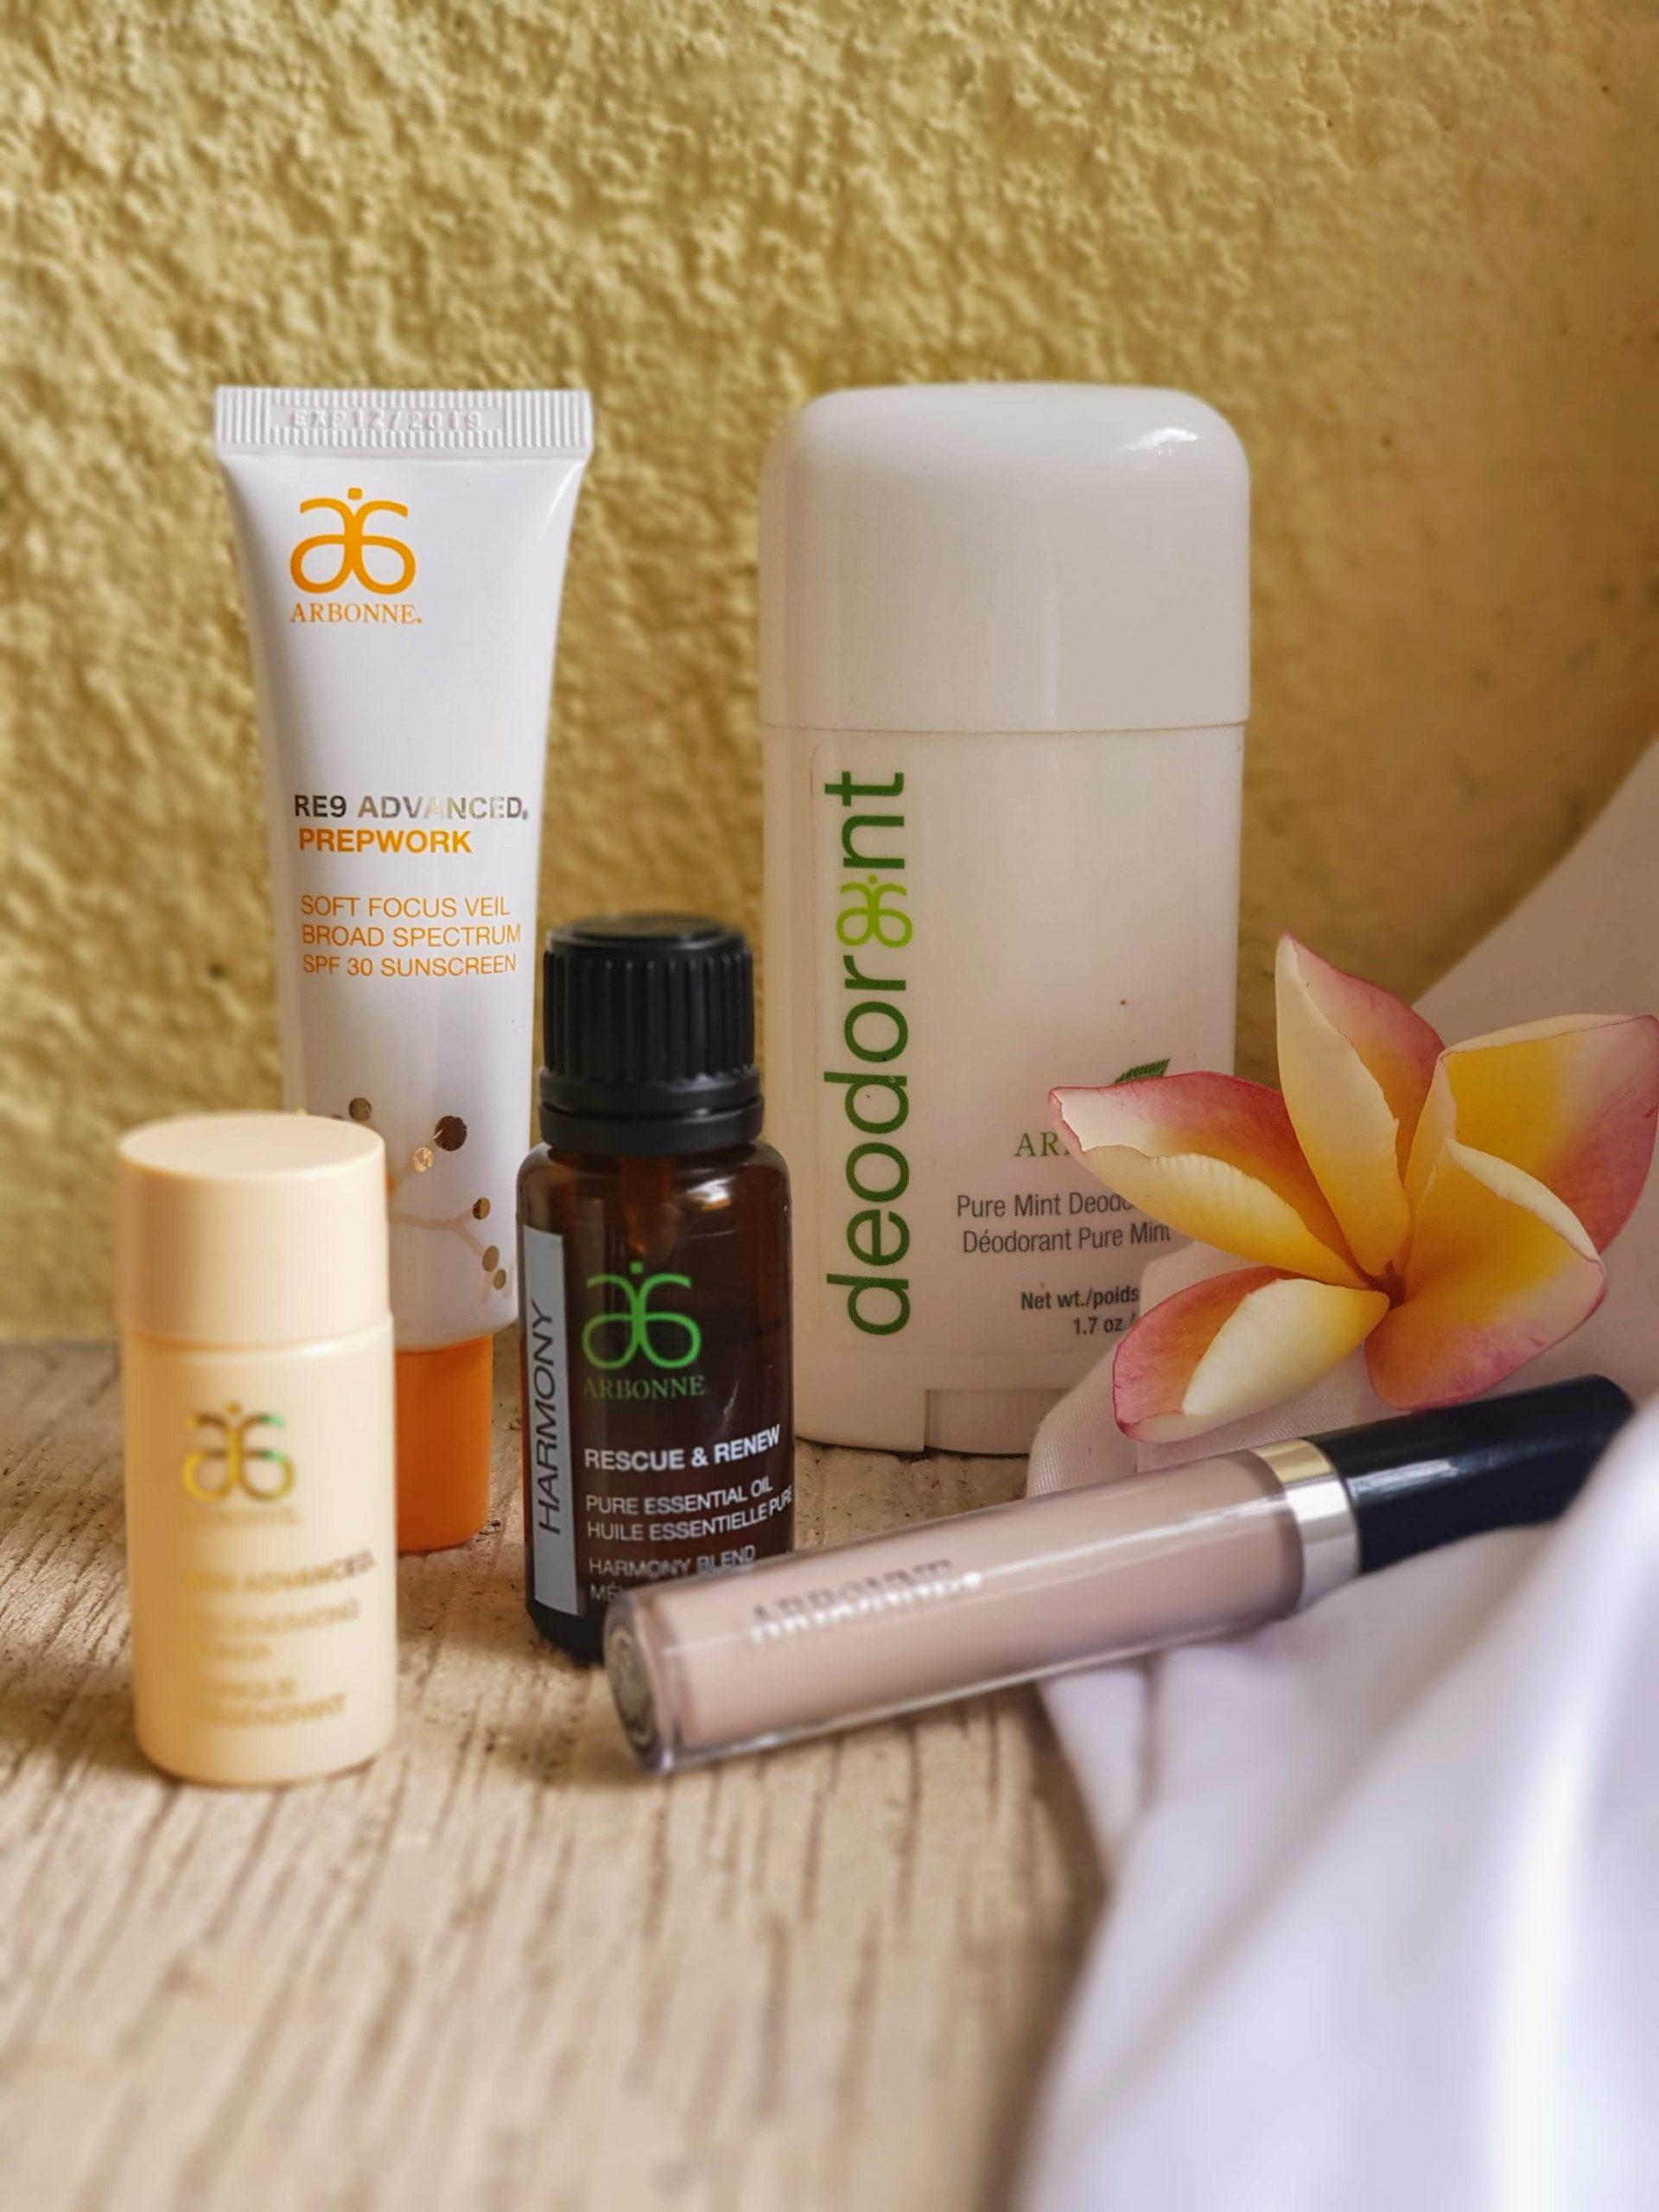 bali beauty heat survival guide essential makeup skincare travel blog vlog plant based